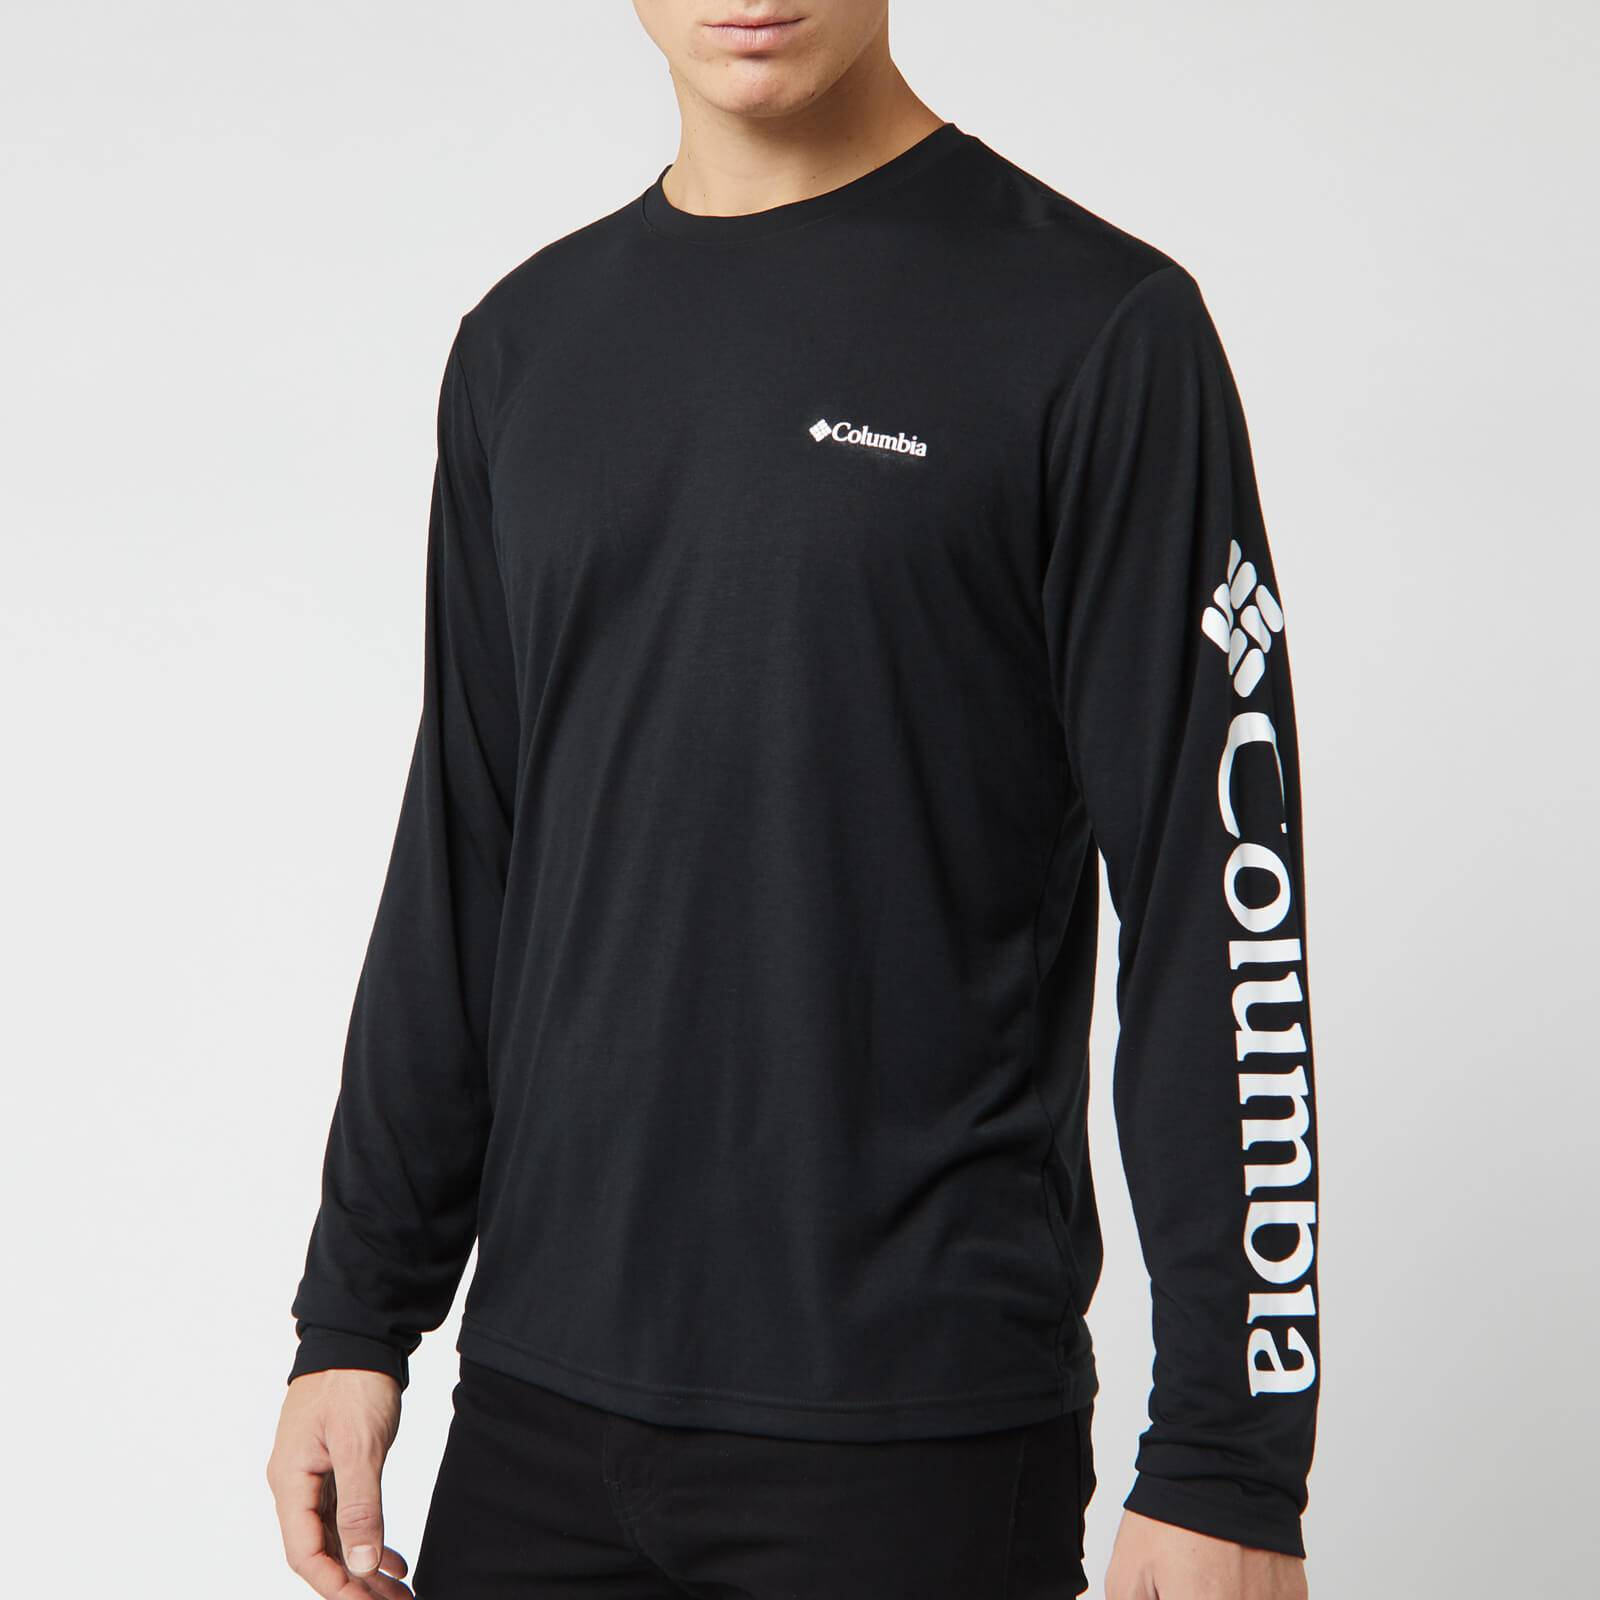 Columbia Men's Miller Valley Long Sleeve Graphic T-Shirt - Black/White - XL